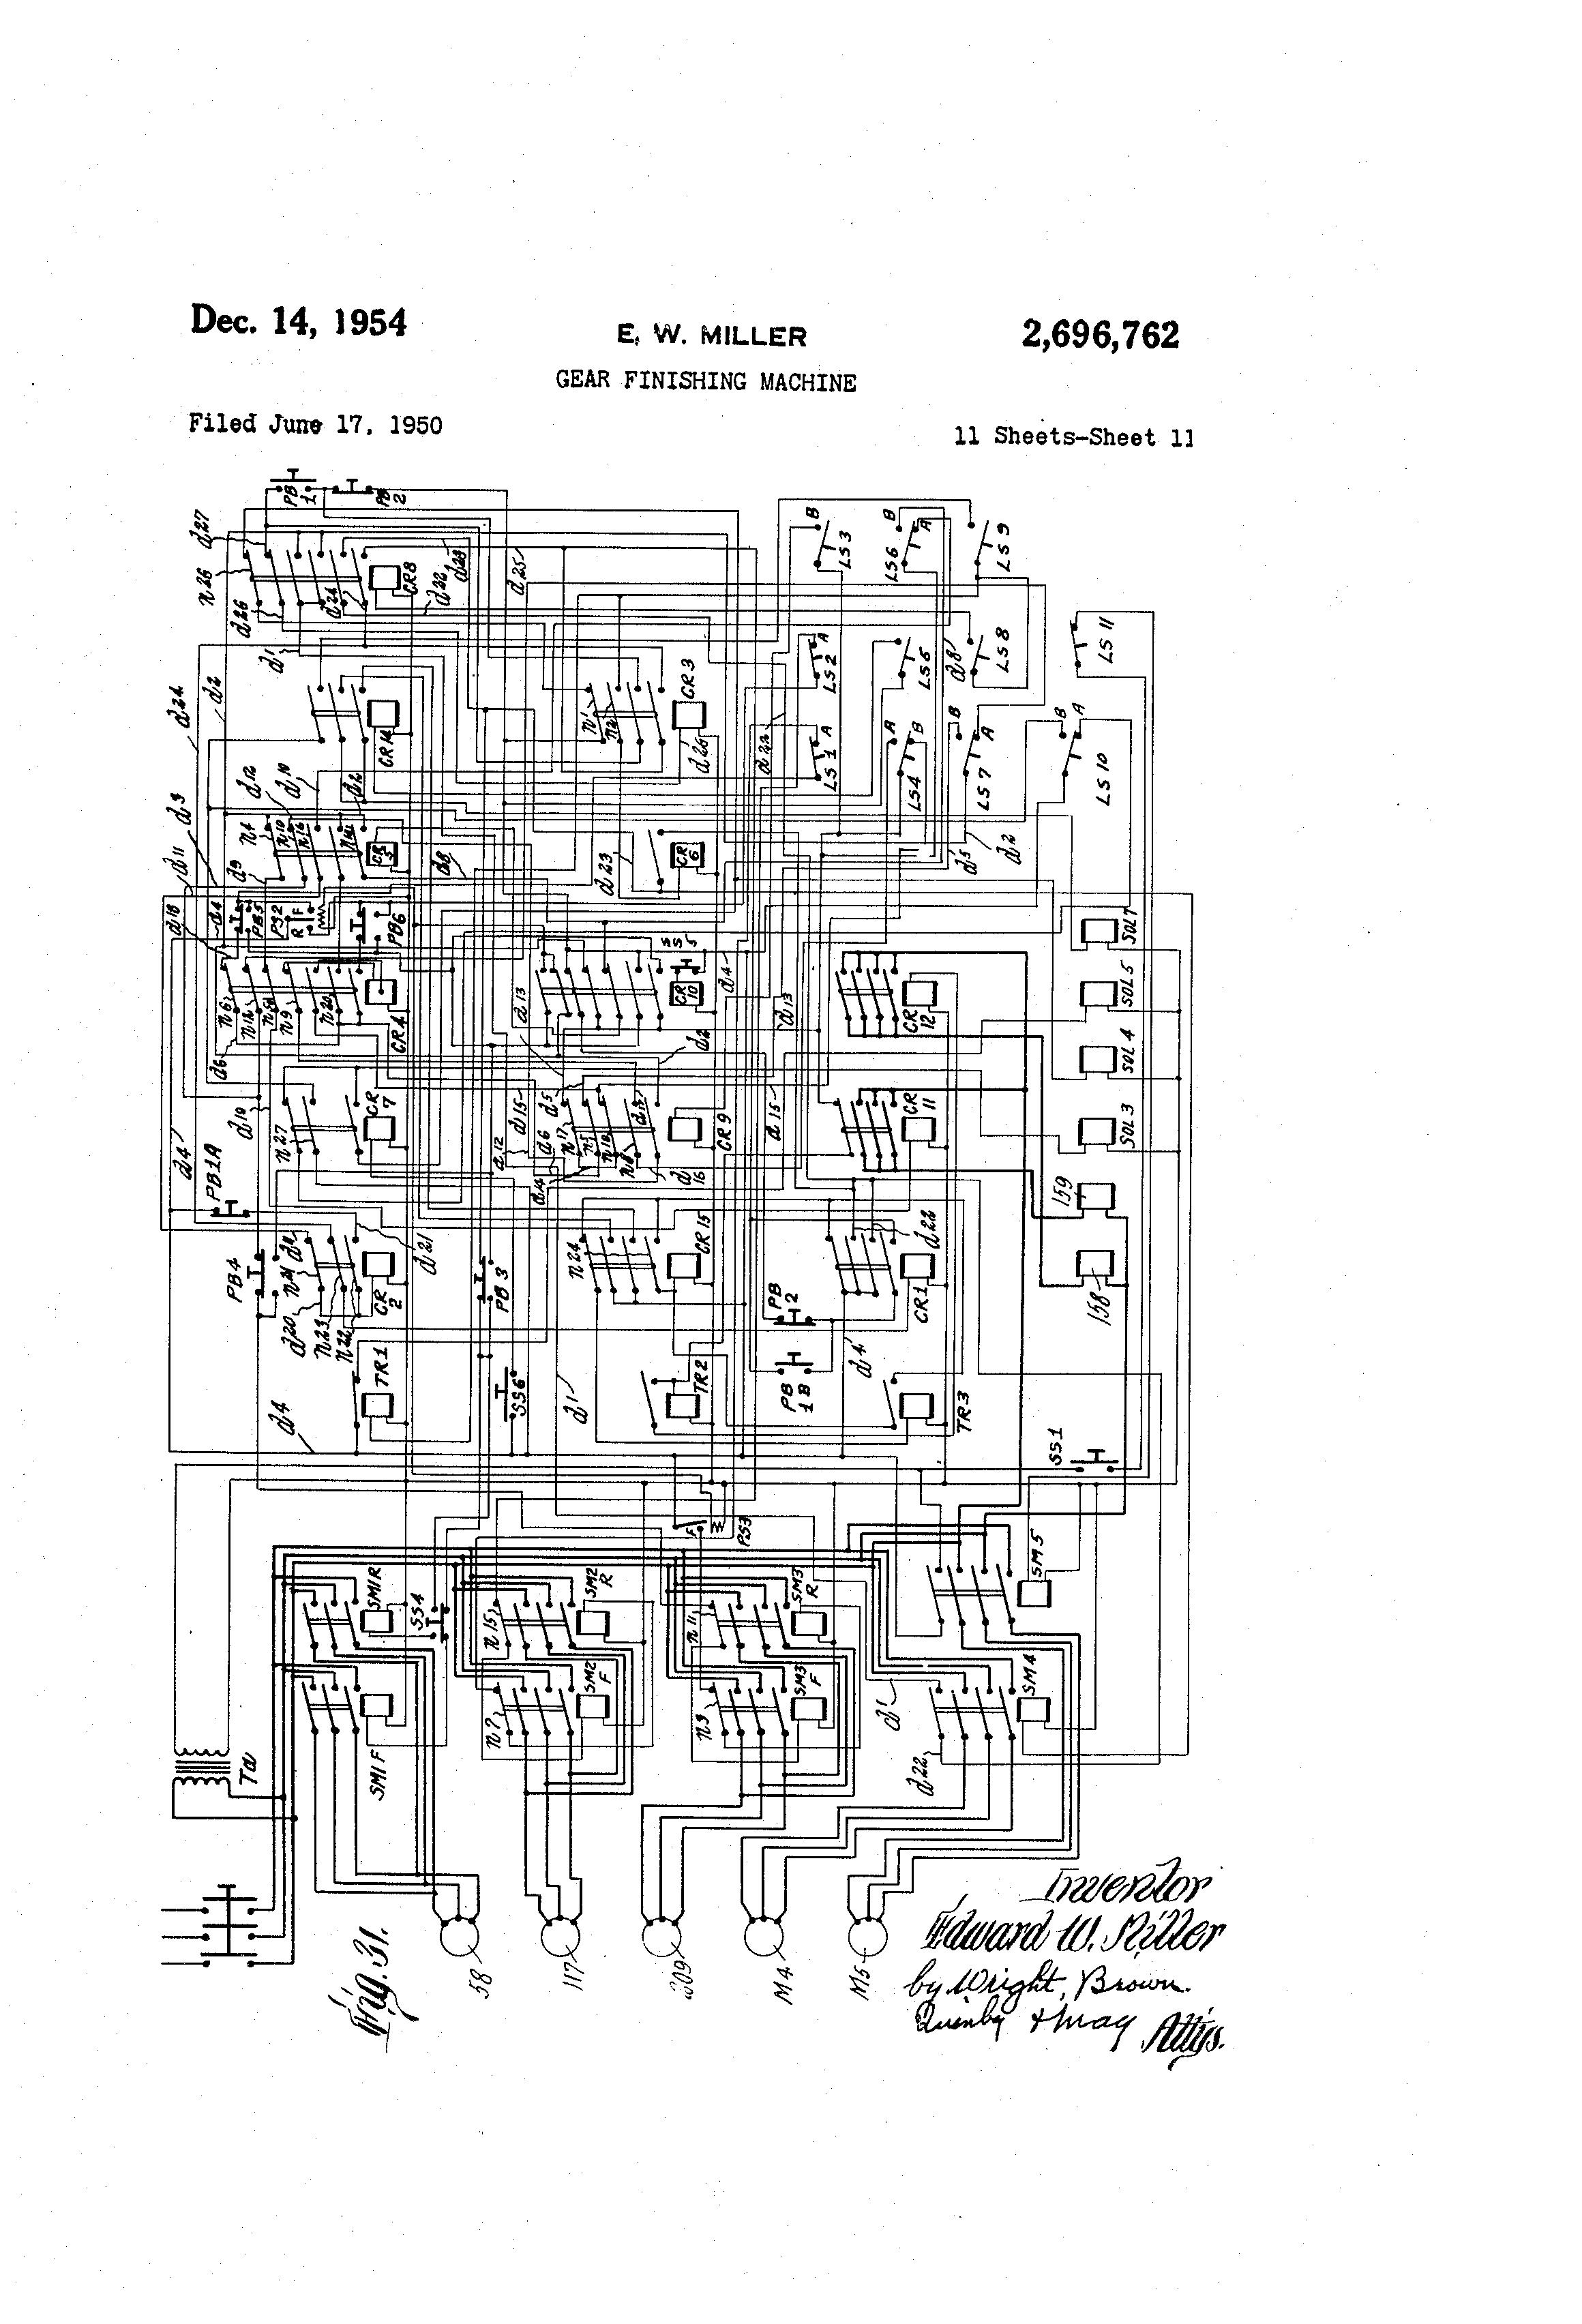 Patent US Gear Finishing Machine Google Patents - Honda ls 125 wiring diagram